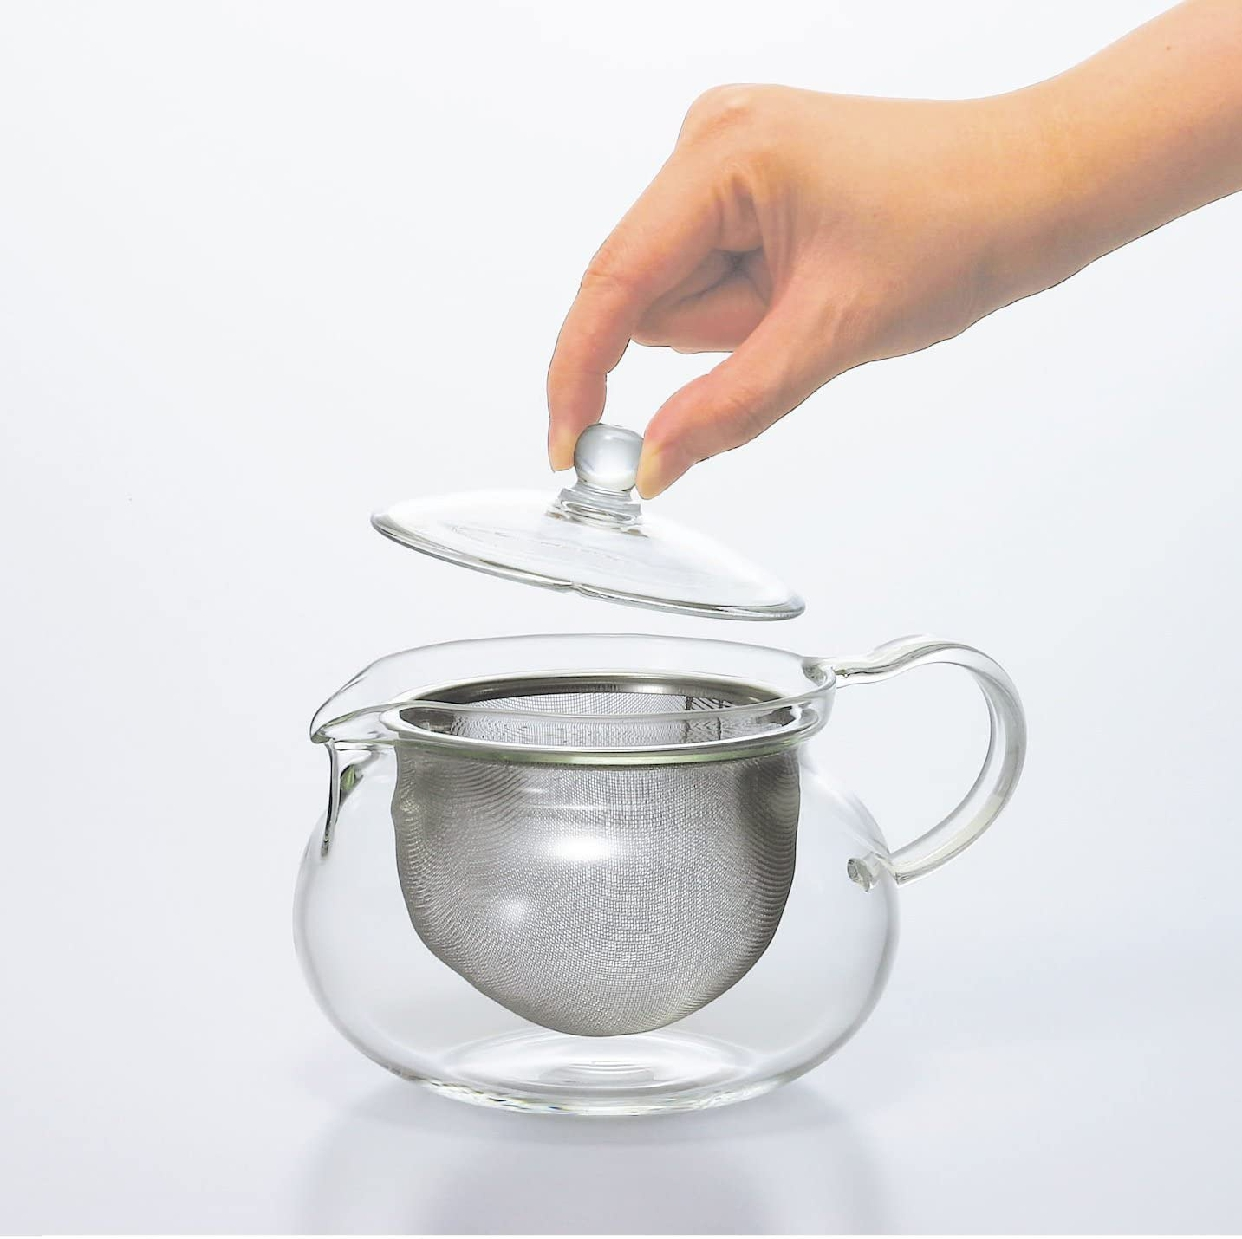 HARIO(ハリオ) 茶茶急須 丸 CHJMN-45T クリアの商品画像3